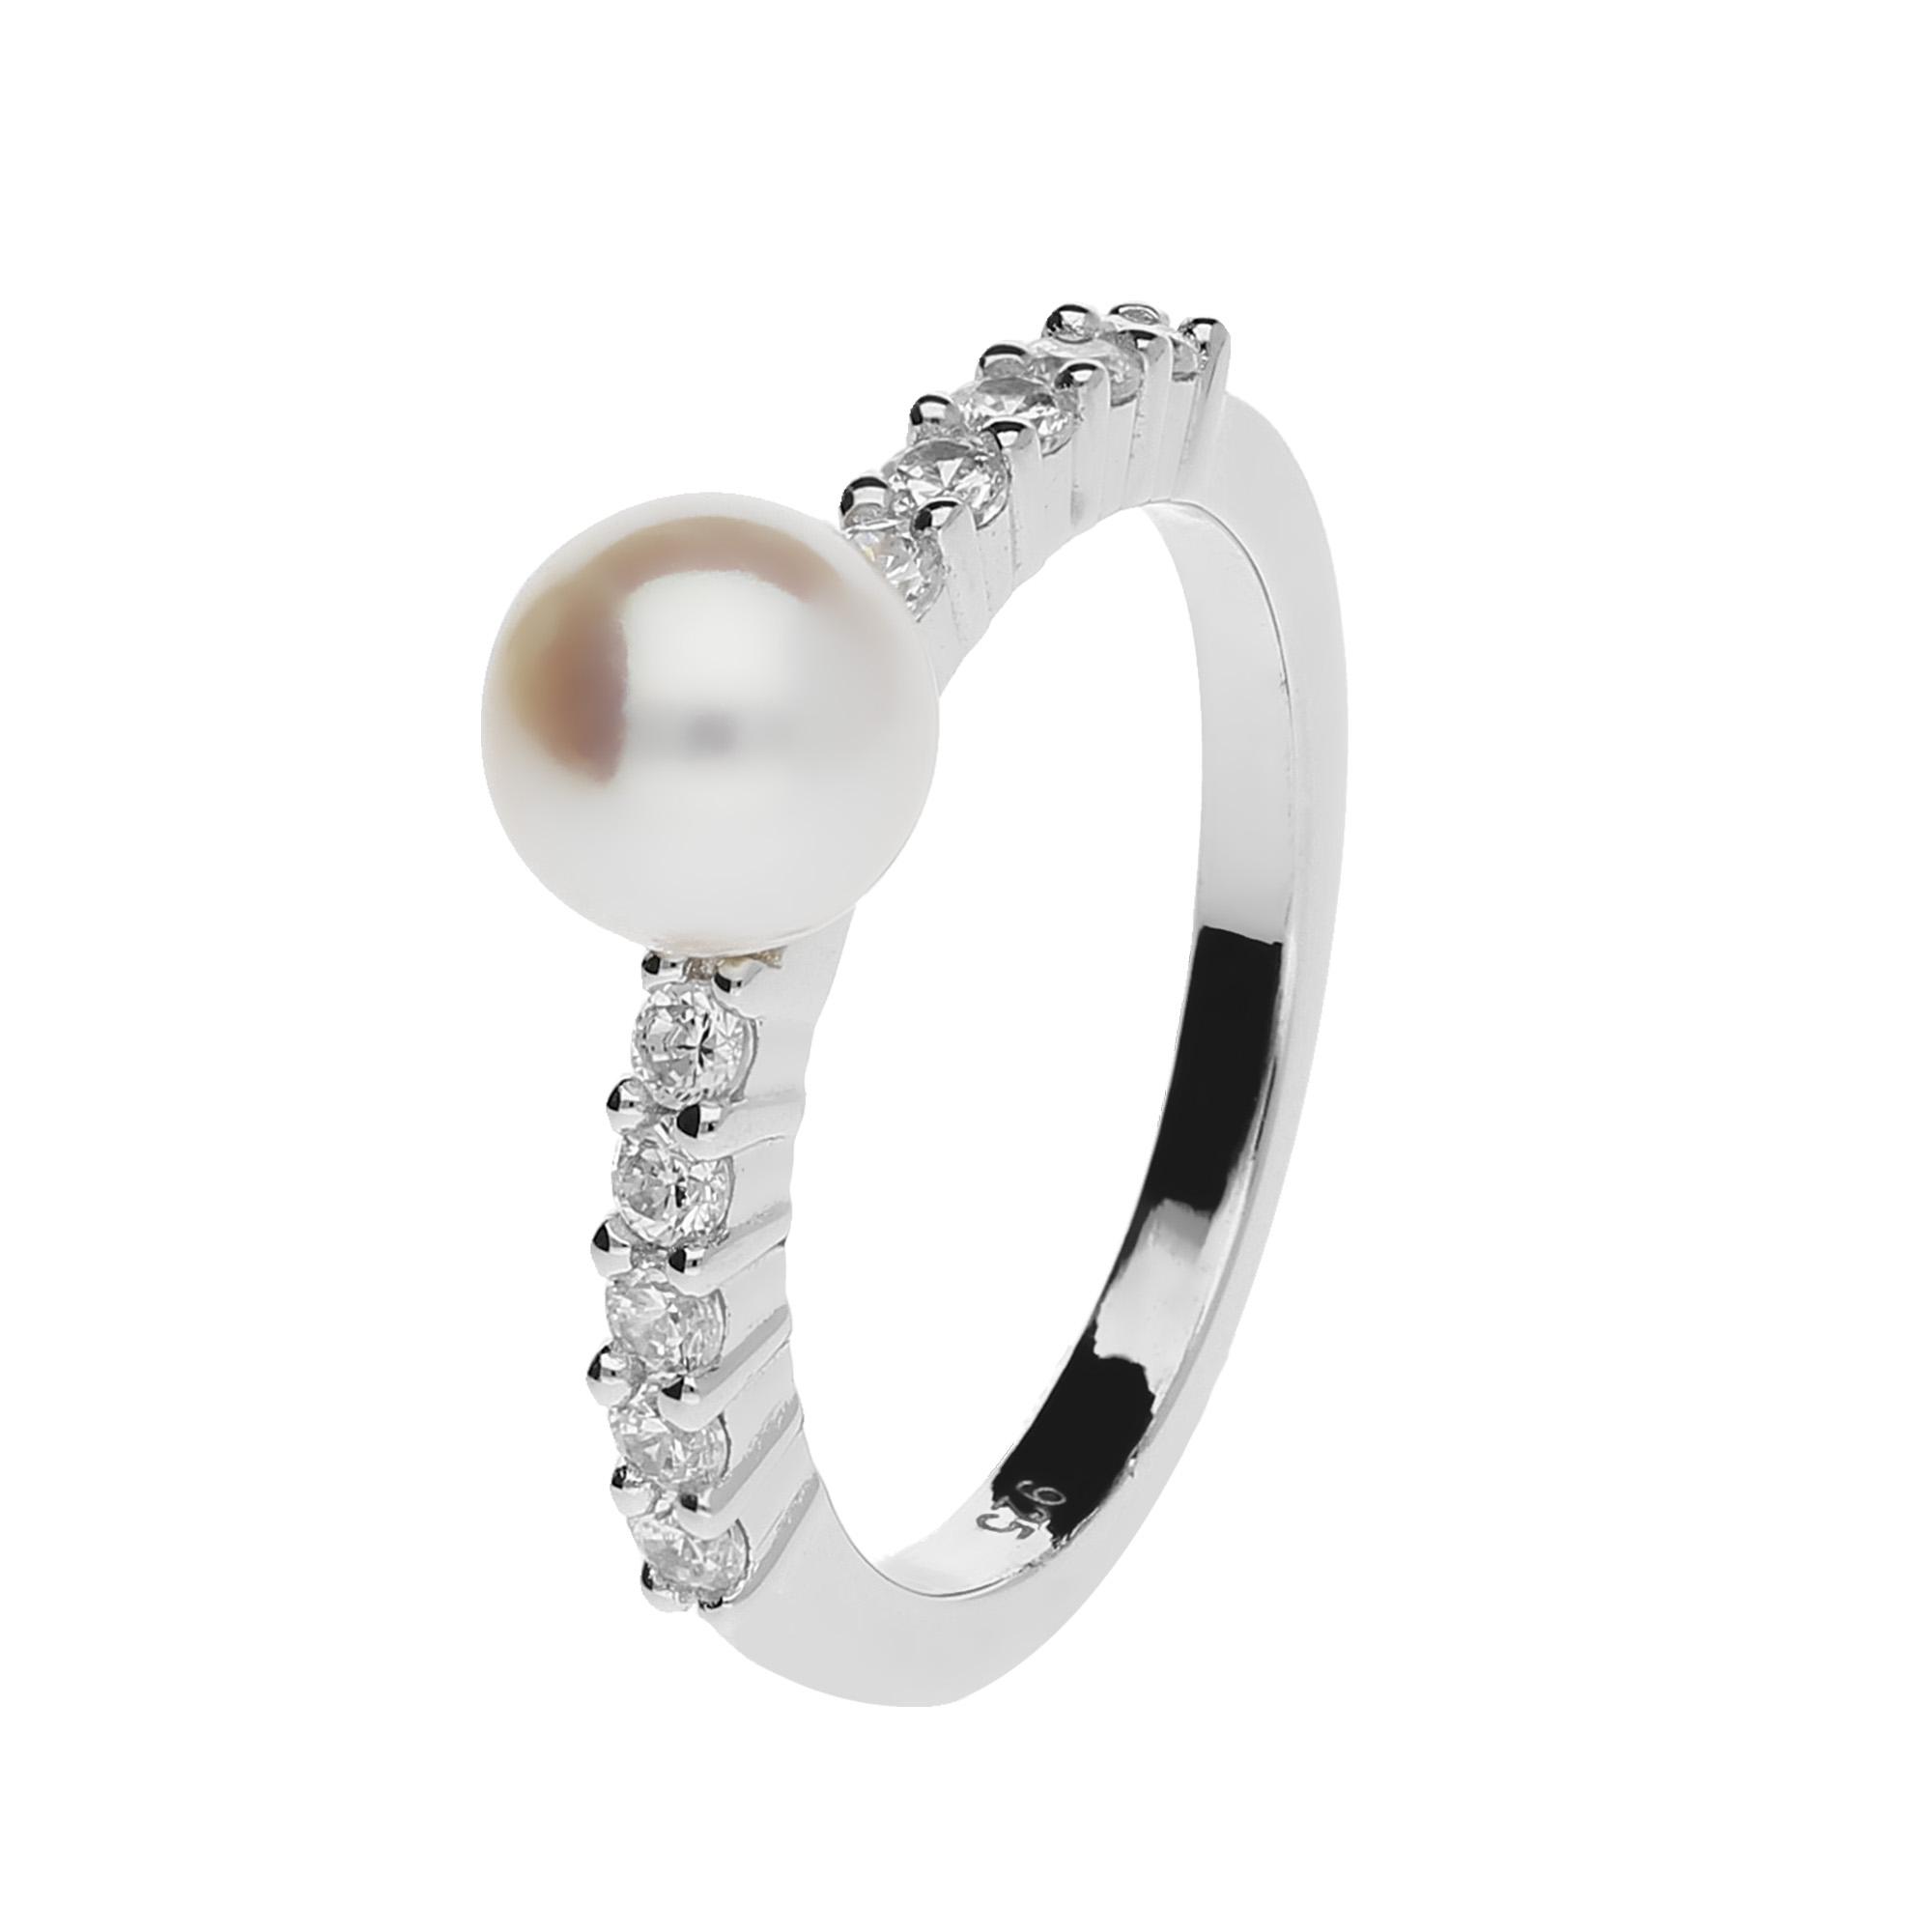 Juwelier Kraemer Ring 925 Silber 52 Mm Juwelier Kraemer